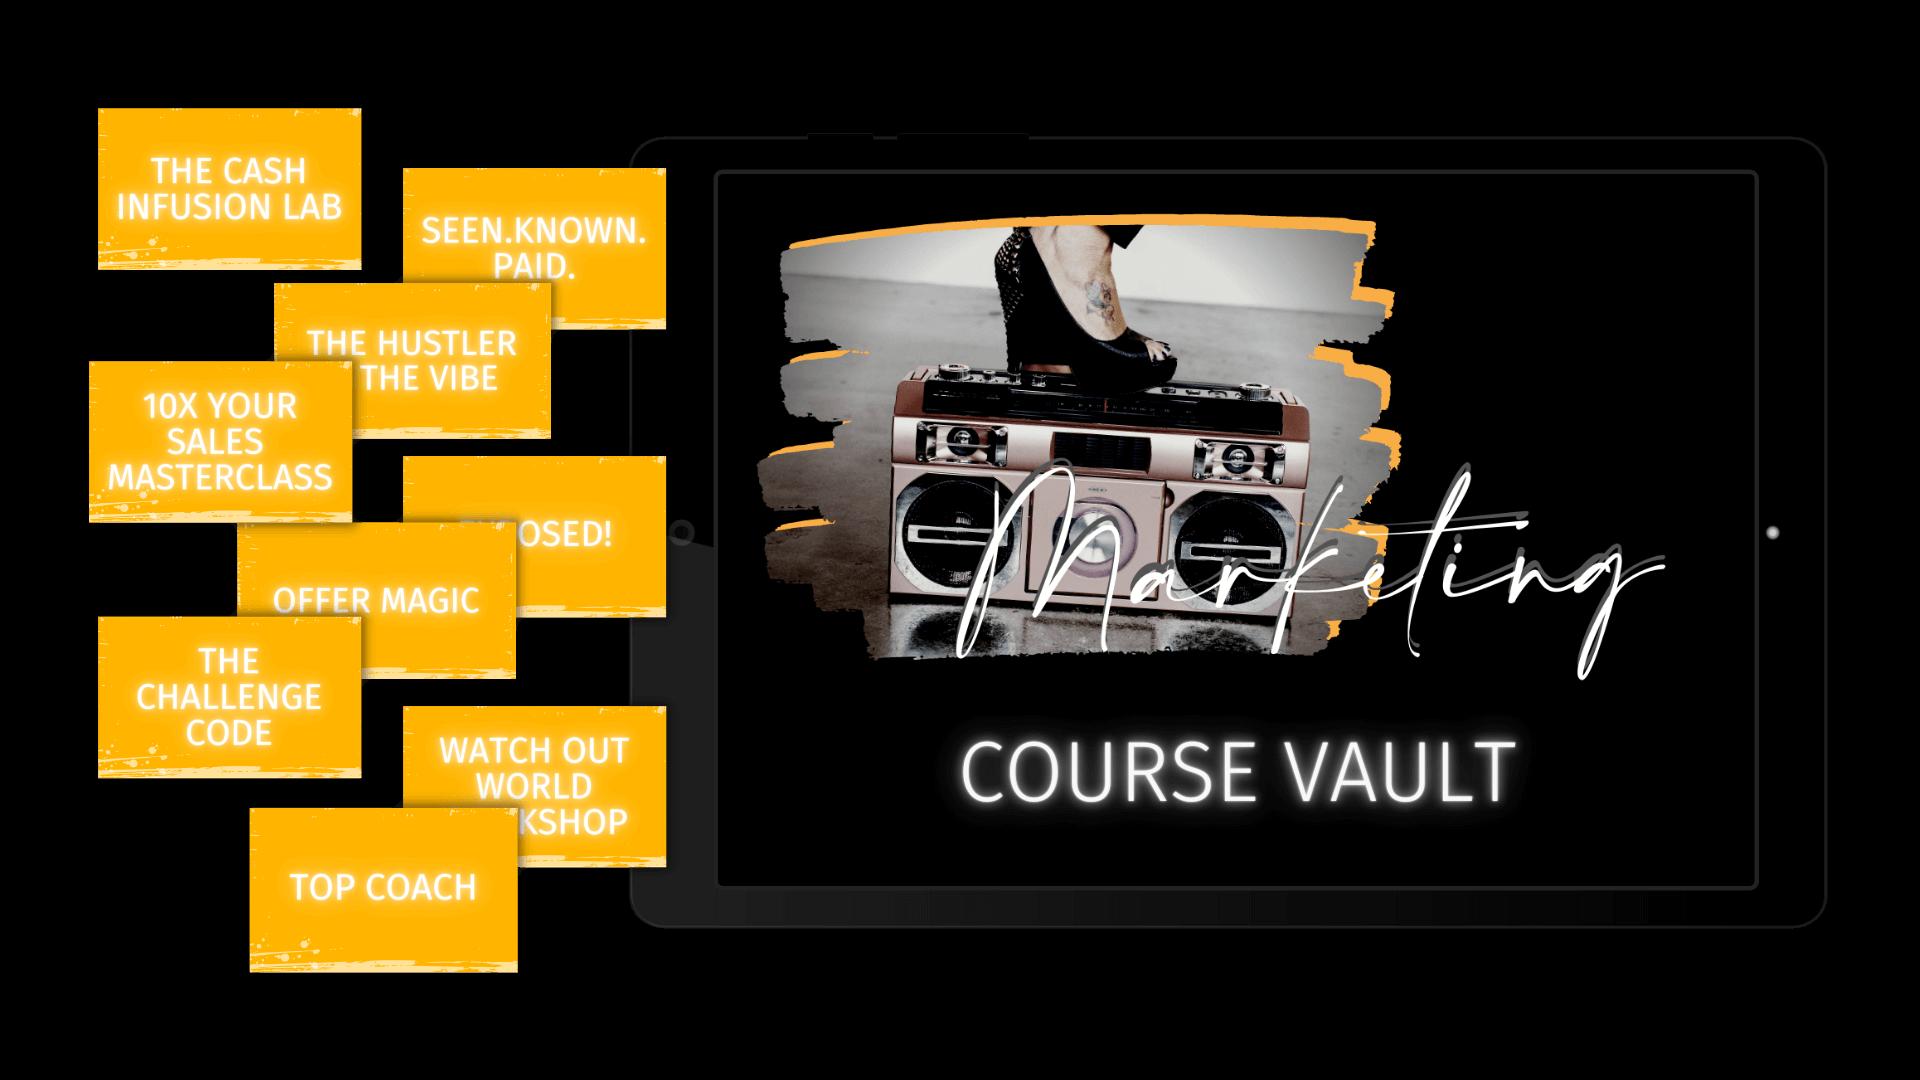 The Ultimate Marketing Course Vault for online entrepreneurs